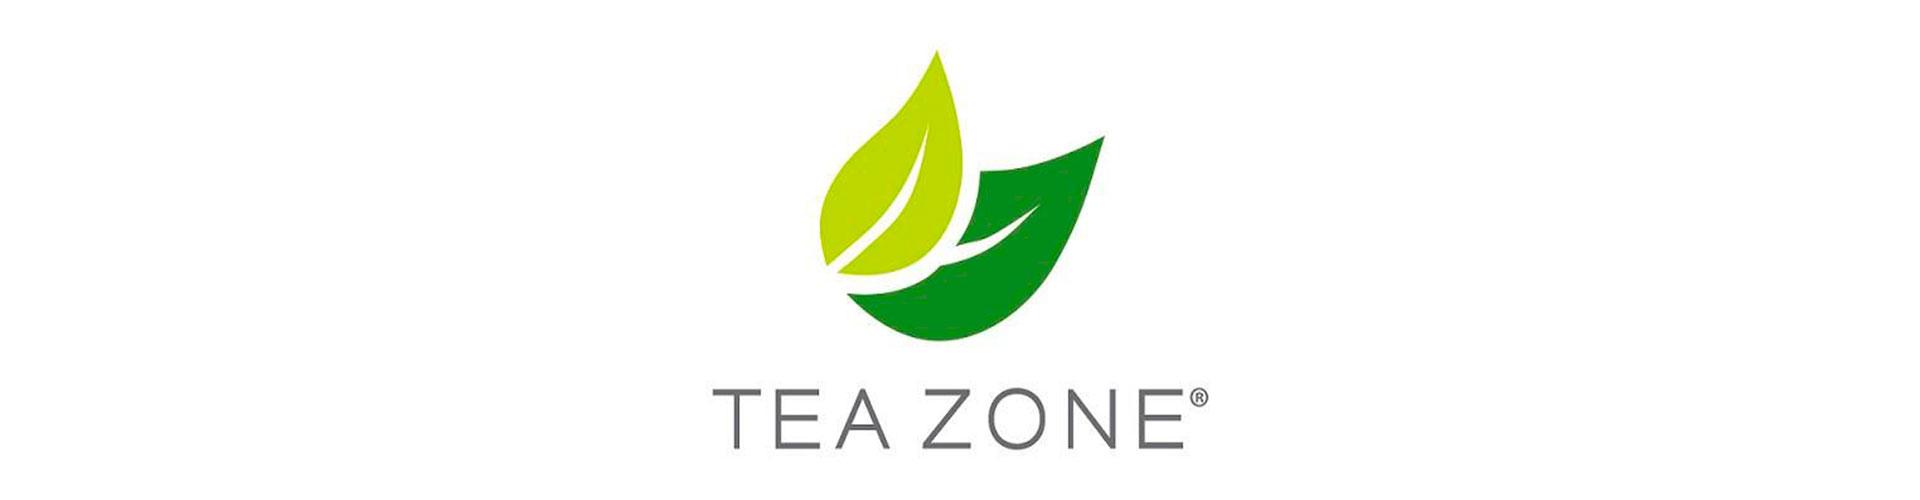 Tea Zone Slider